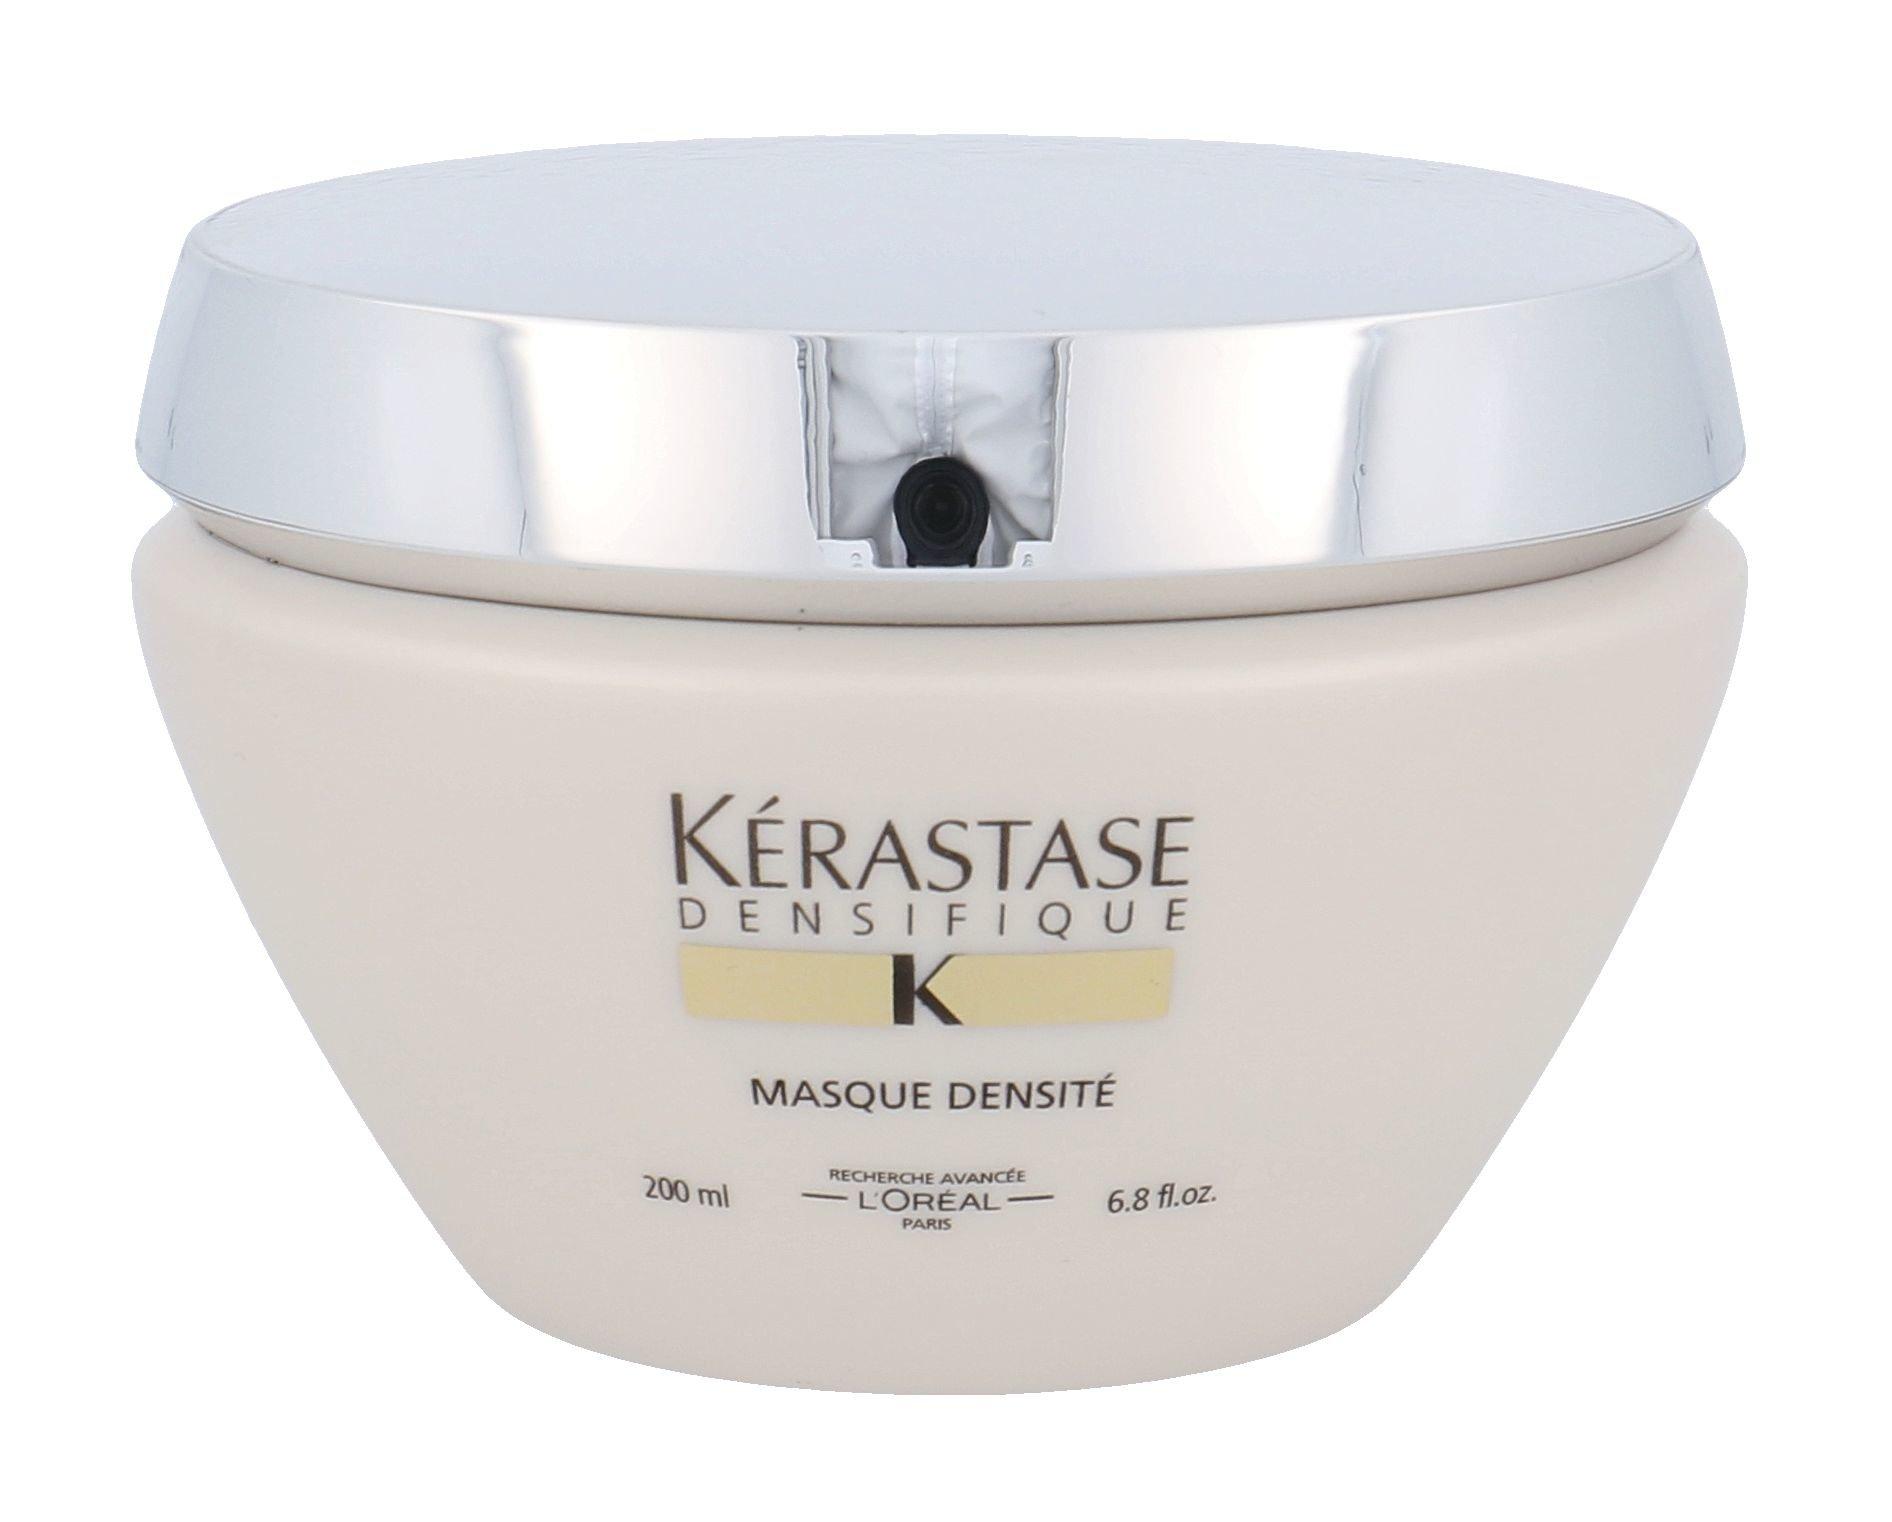 Kérastase Densifique Cosmetic 200ml